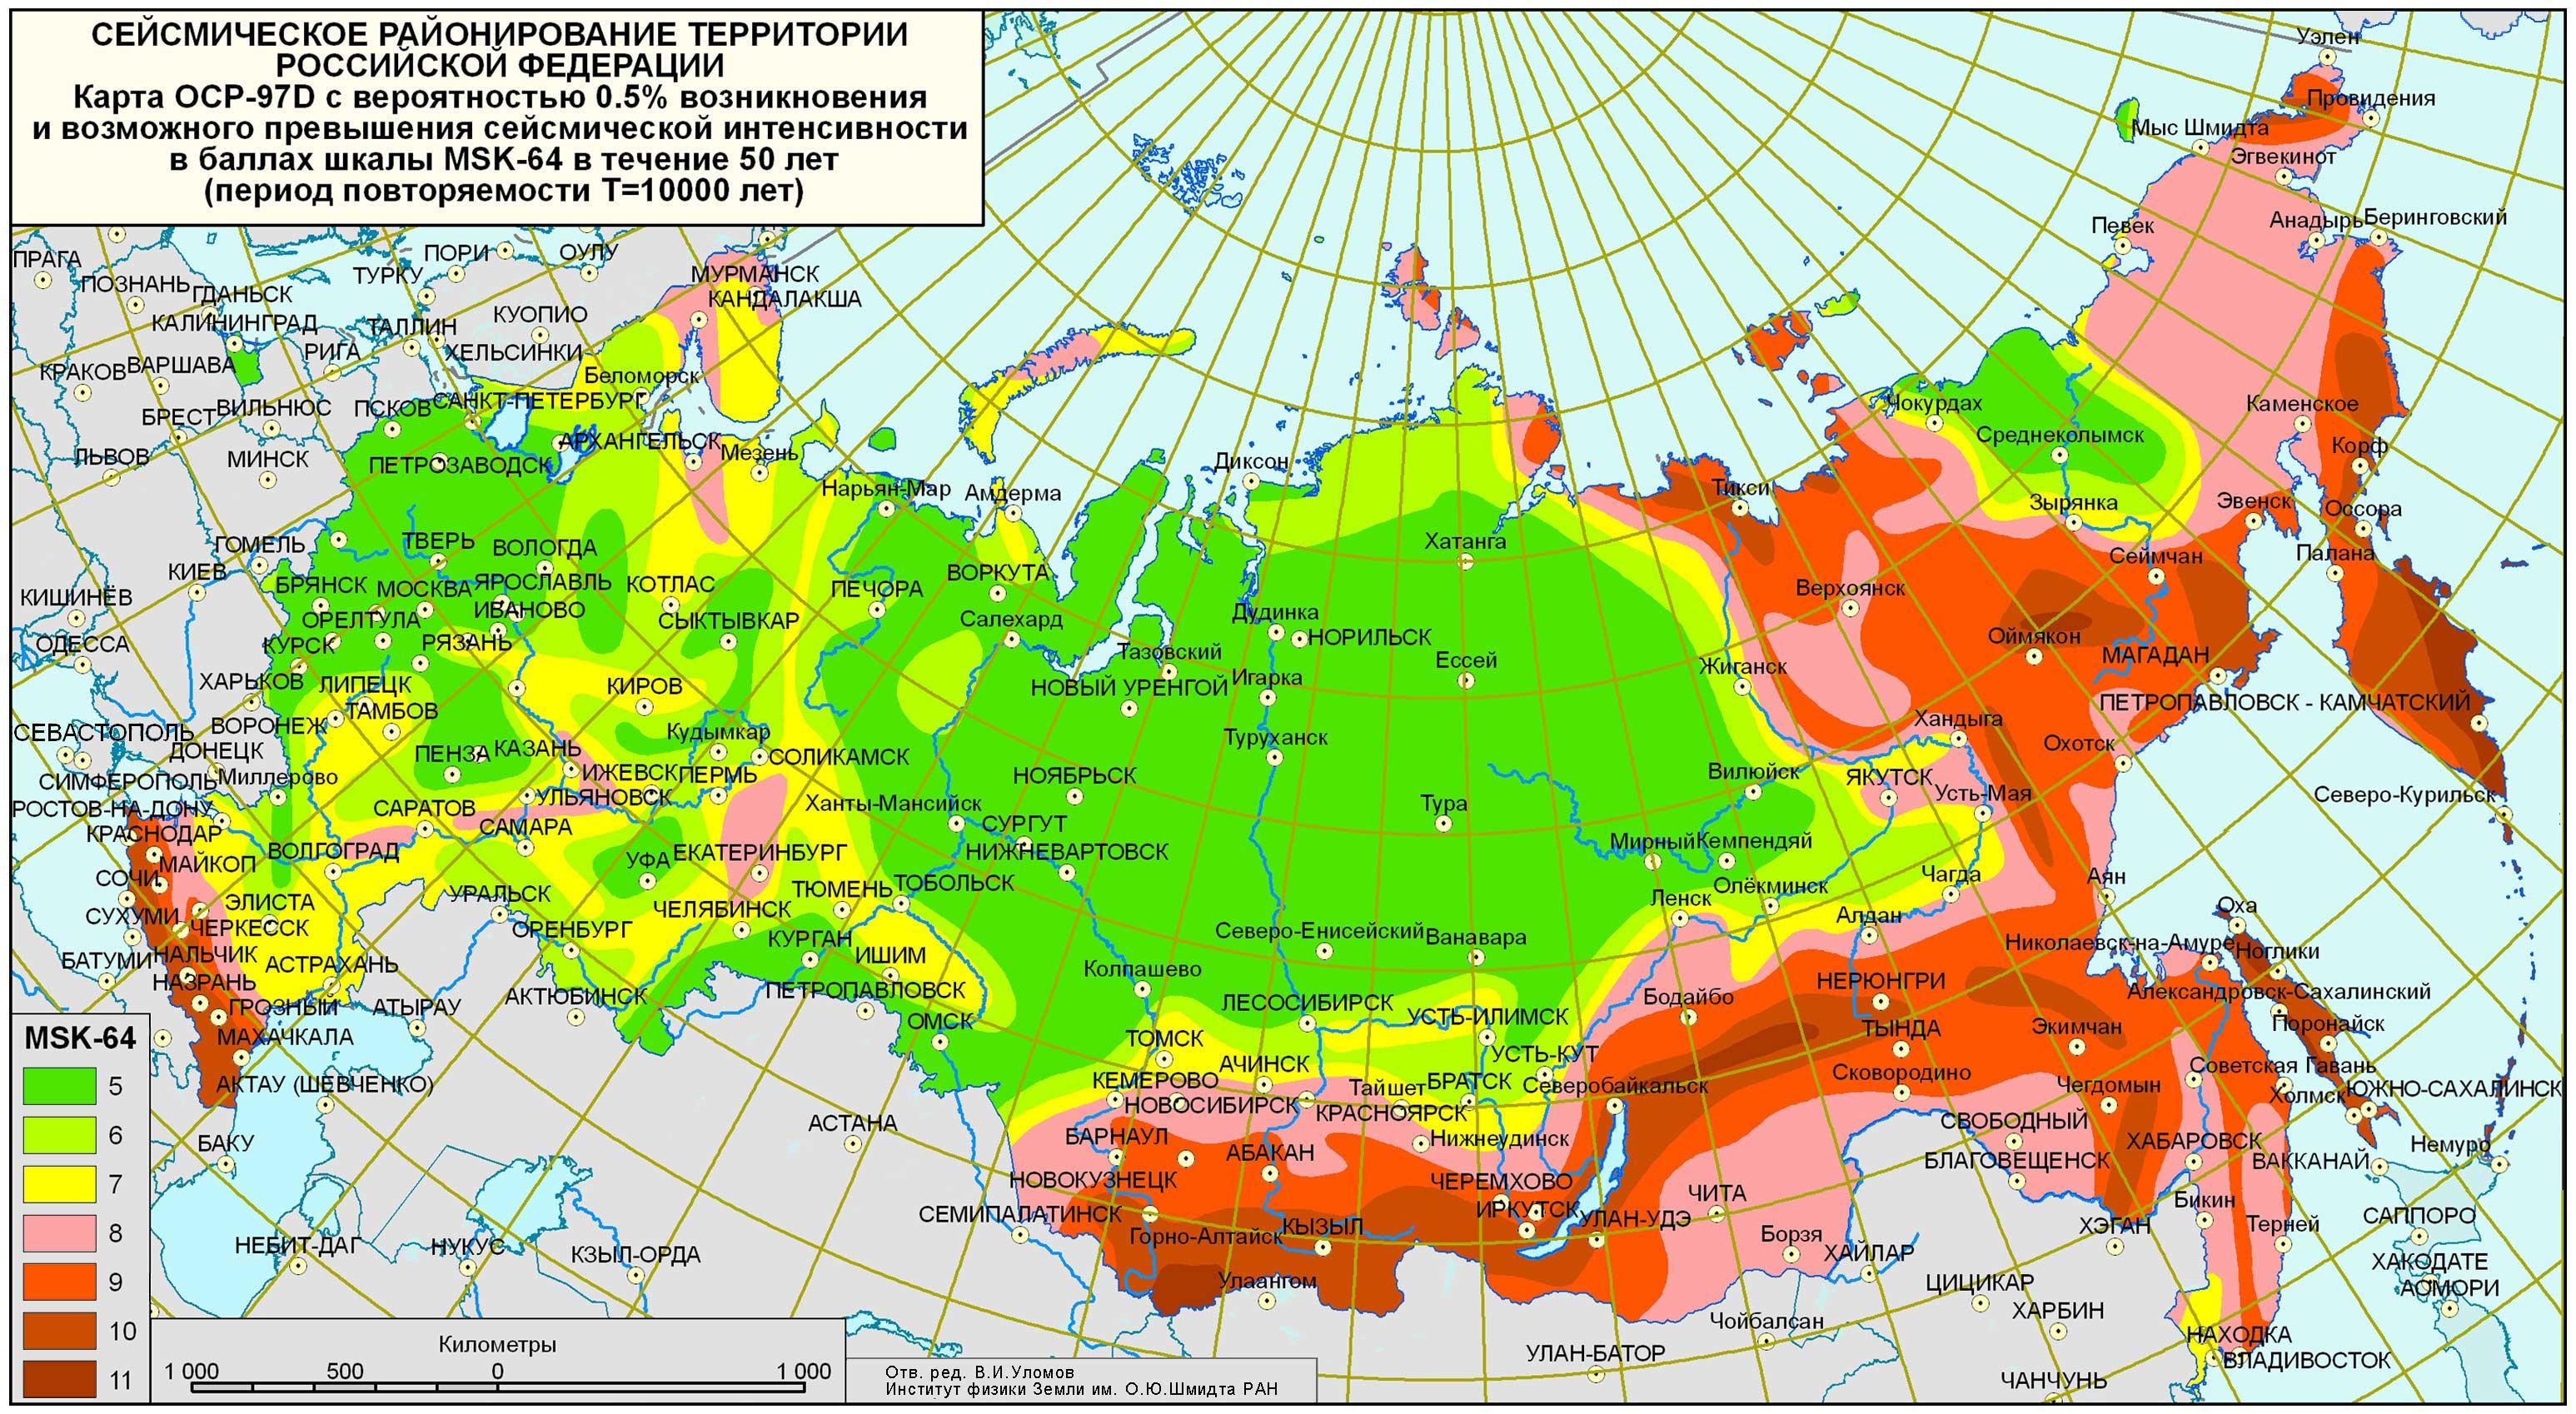 http://eurolmk.ru/downloads2/euroLMK_karta_seismo.jpg